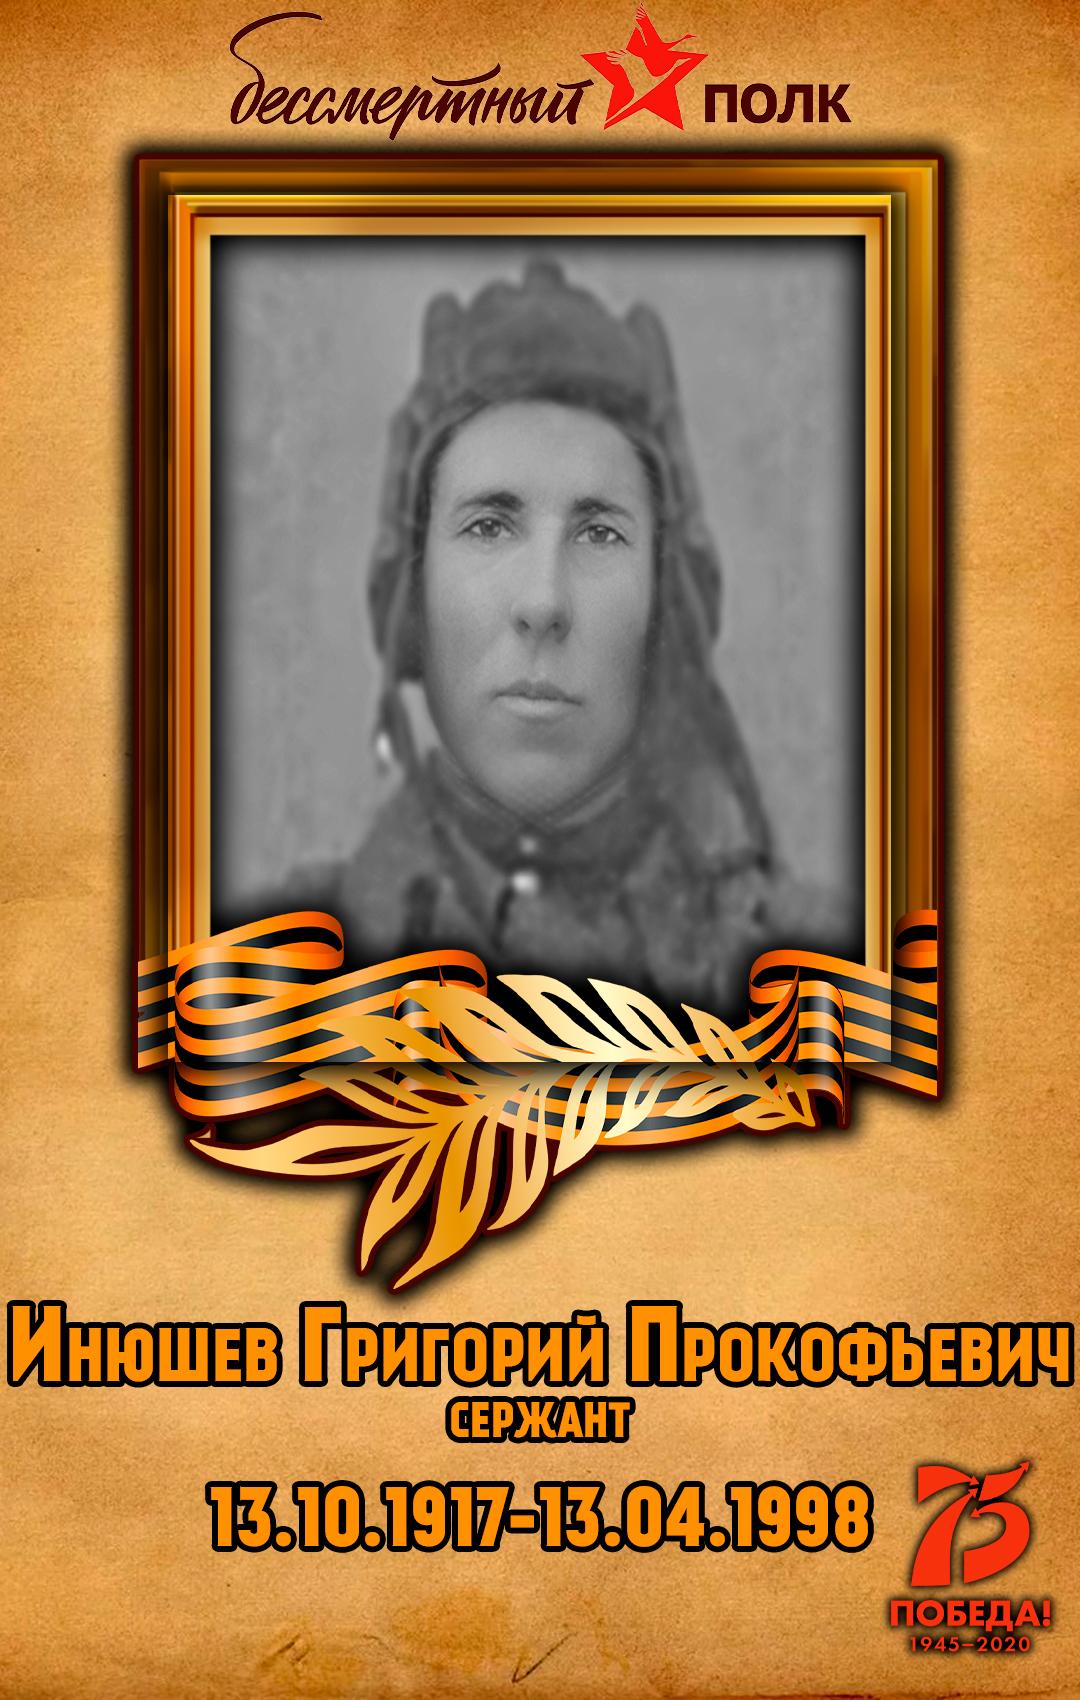 Инюшев-Григорий-Прокофьевич